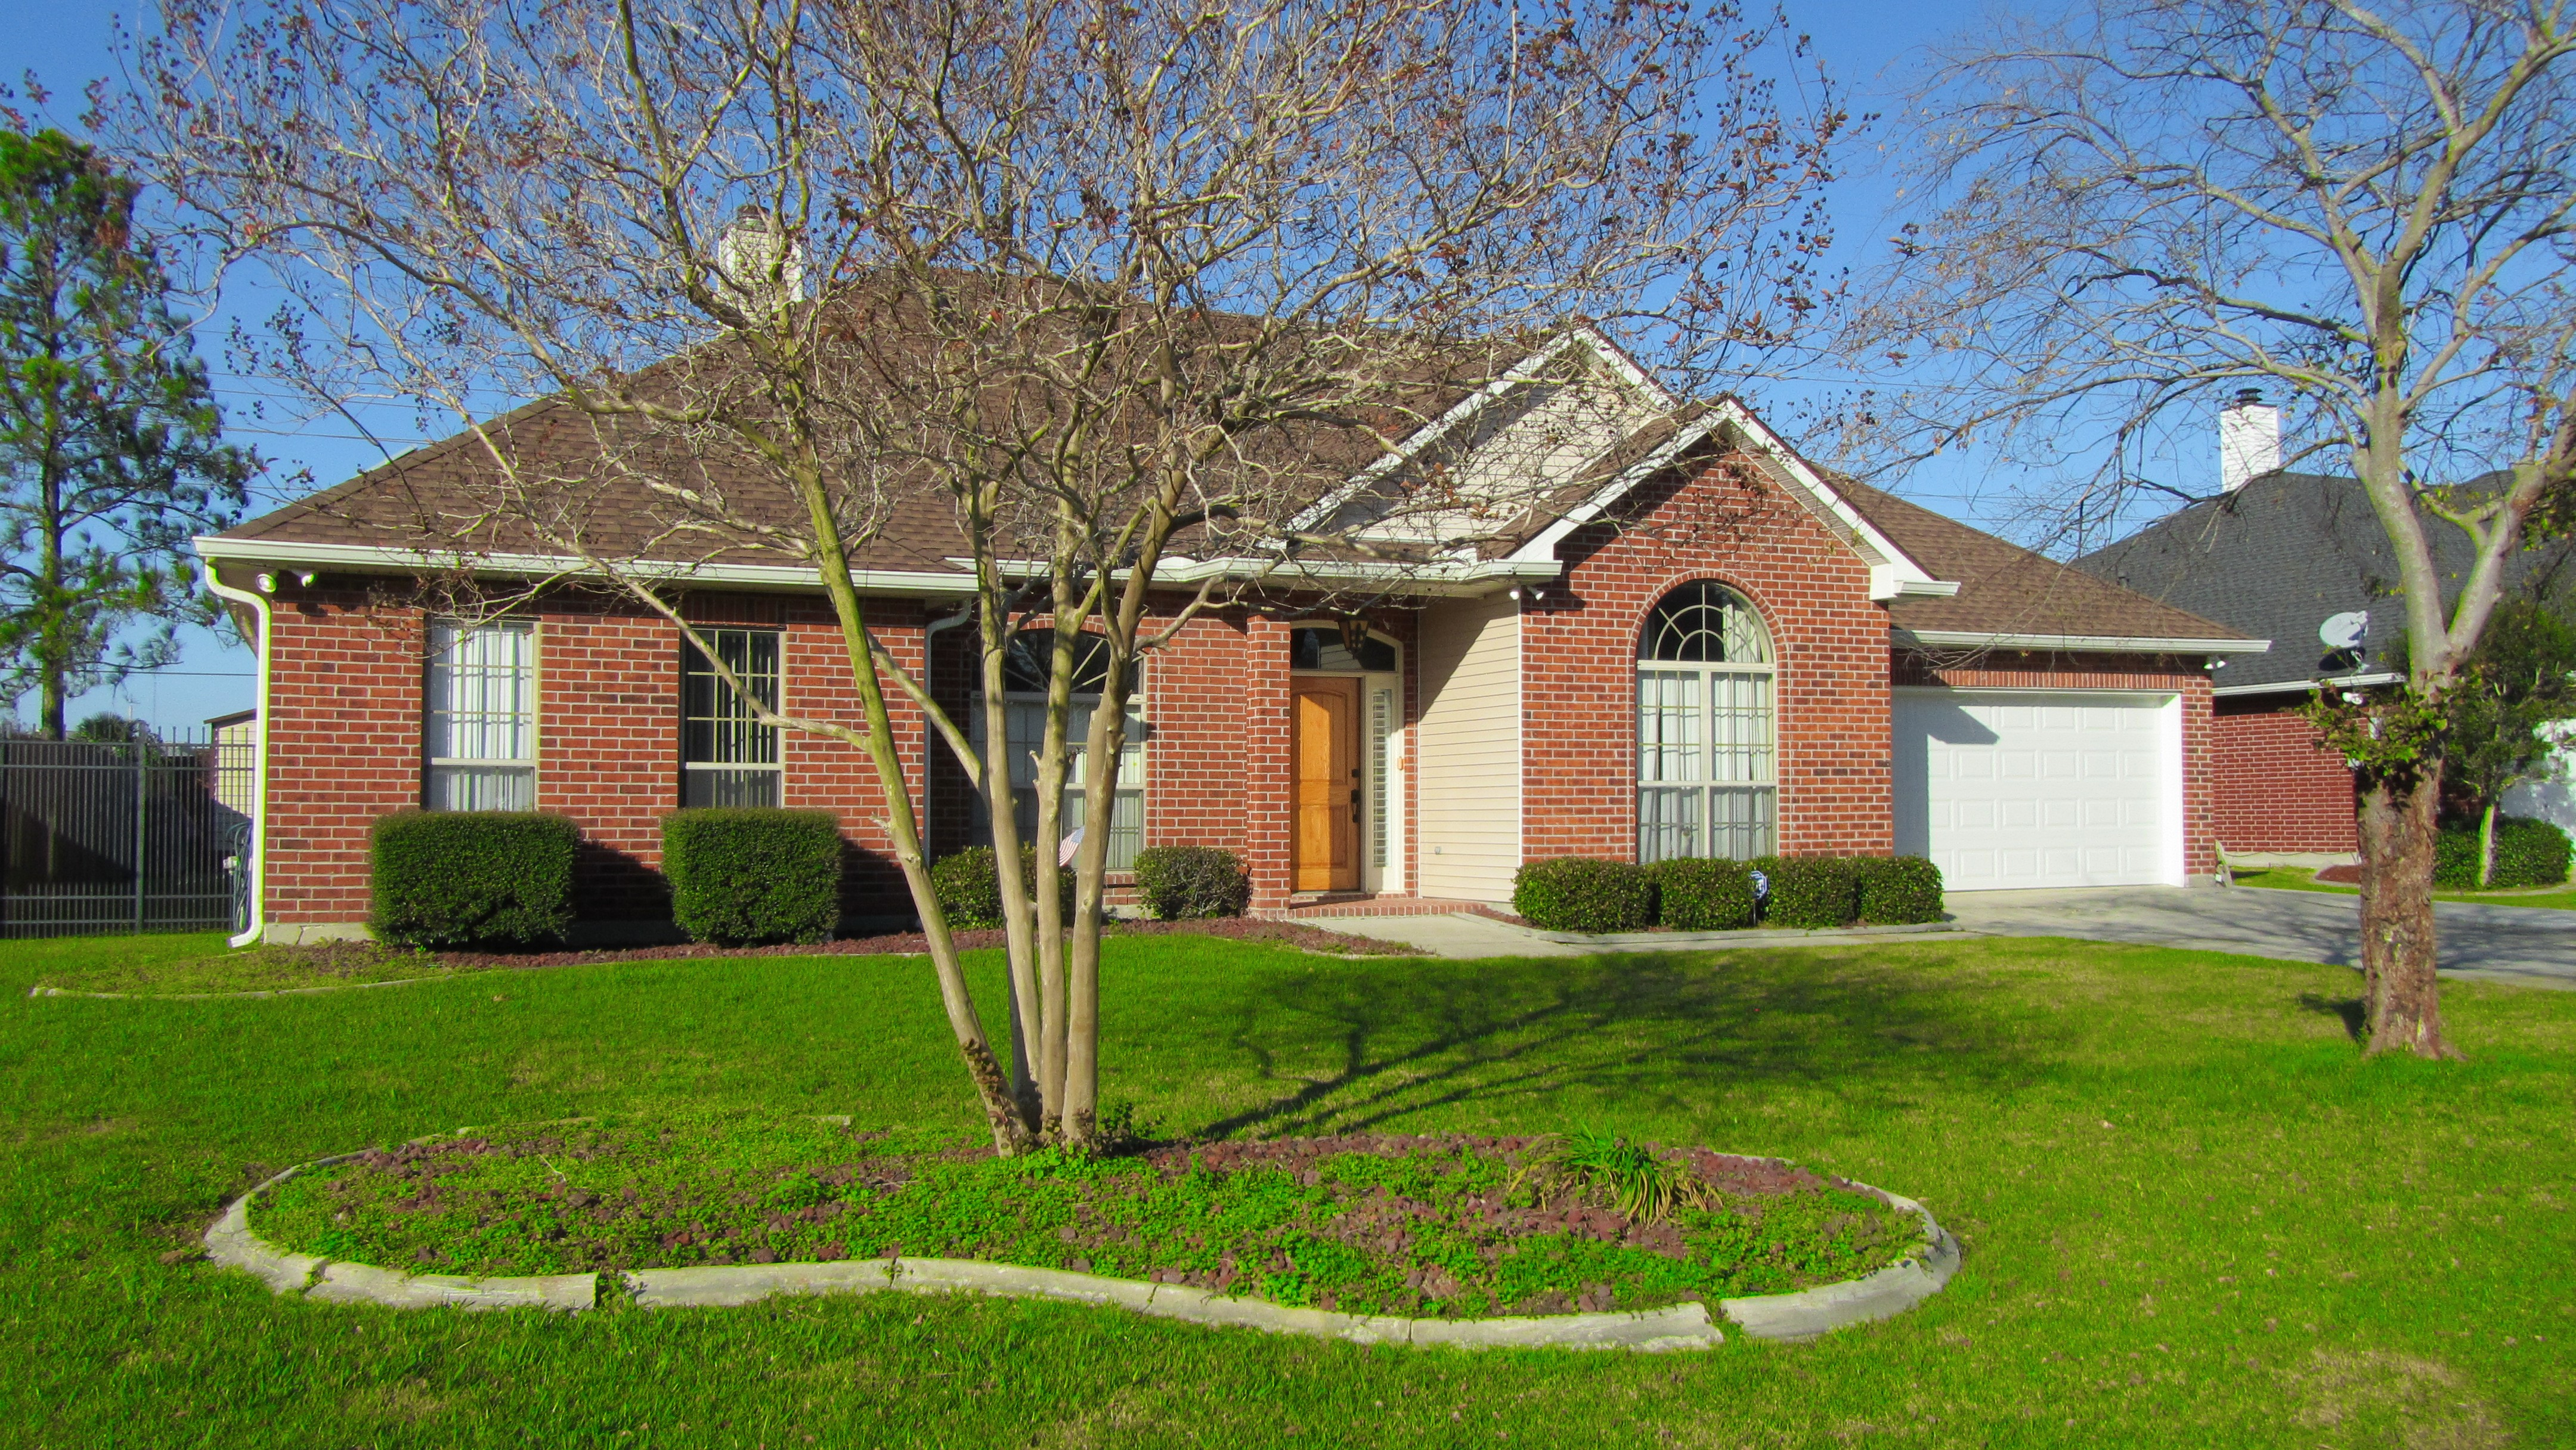 1309 Lake Frances Dr, Gretna, Louisiana 70056